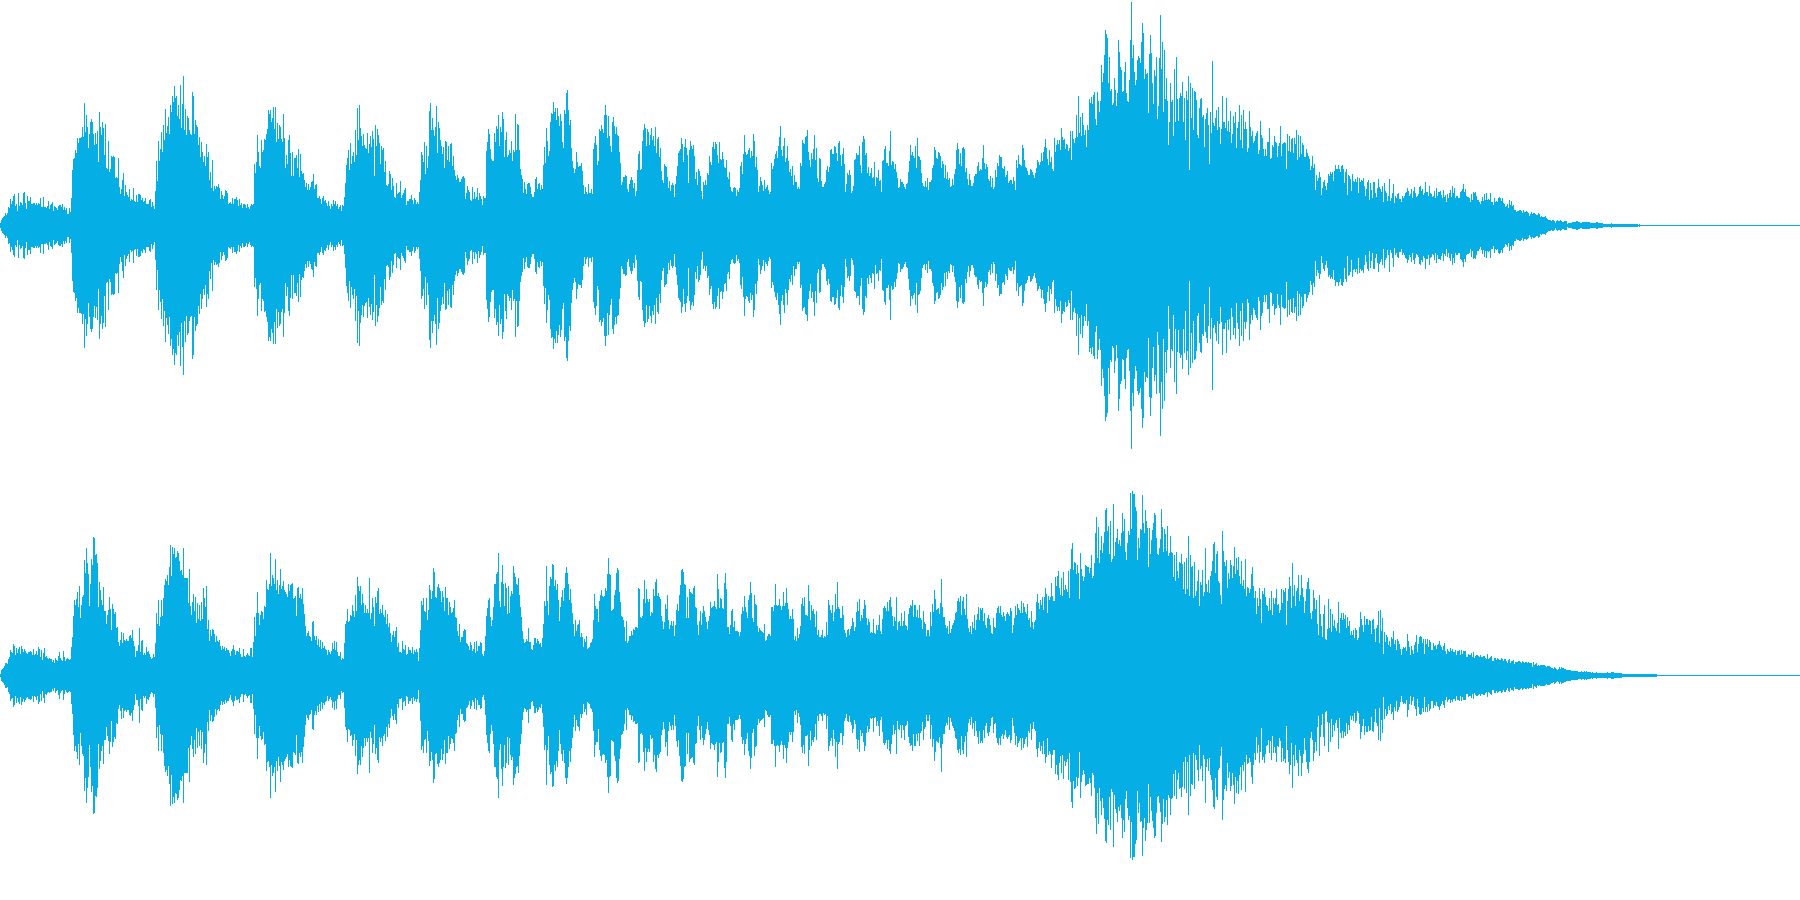 CINEMATIC RISER_07の再生済みの波形